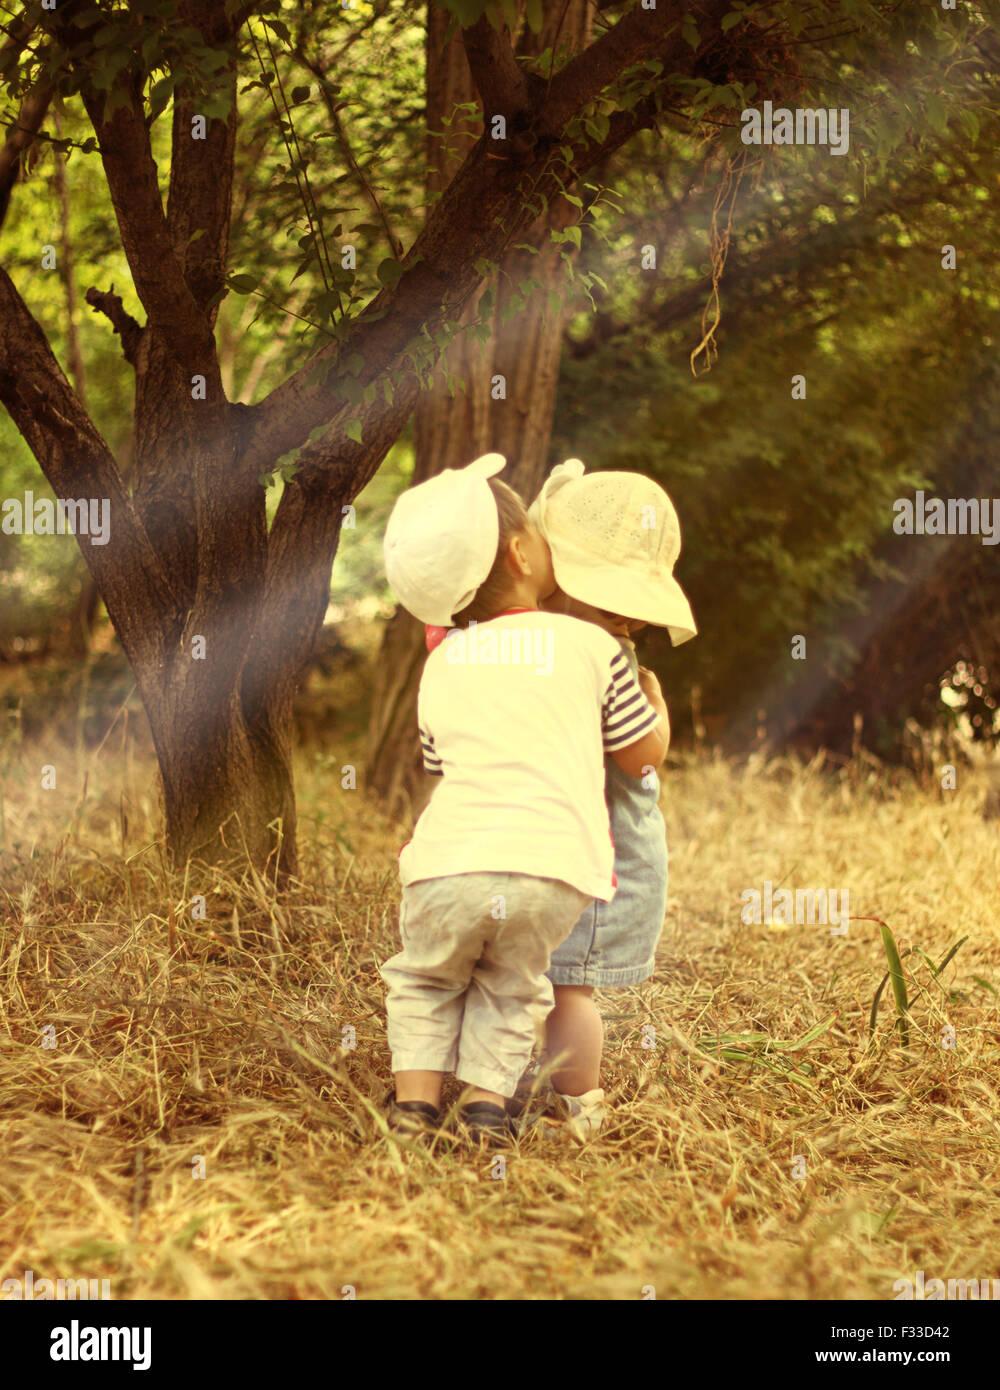 Children's secrets. - Stock Image